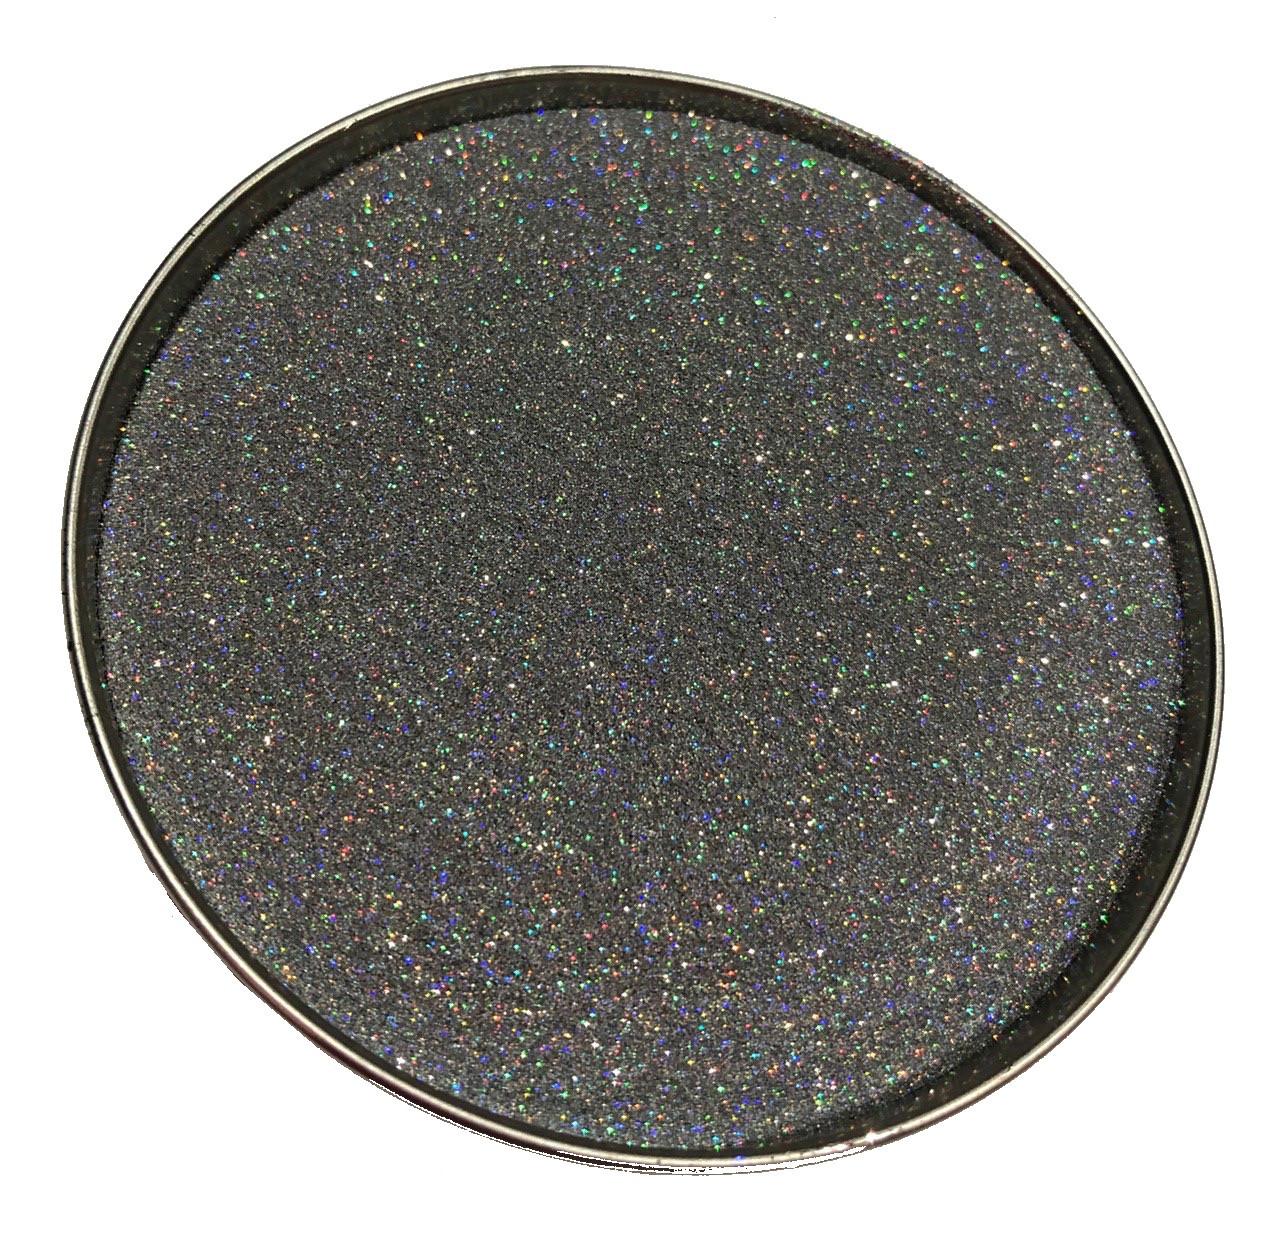 Глиттер  серебро галографическое TL001-256, 150мл